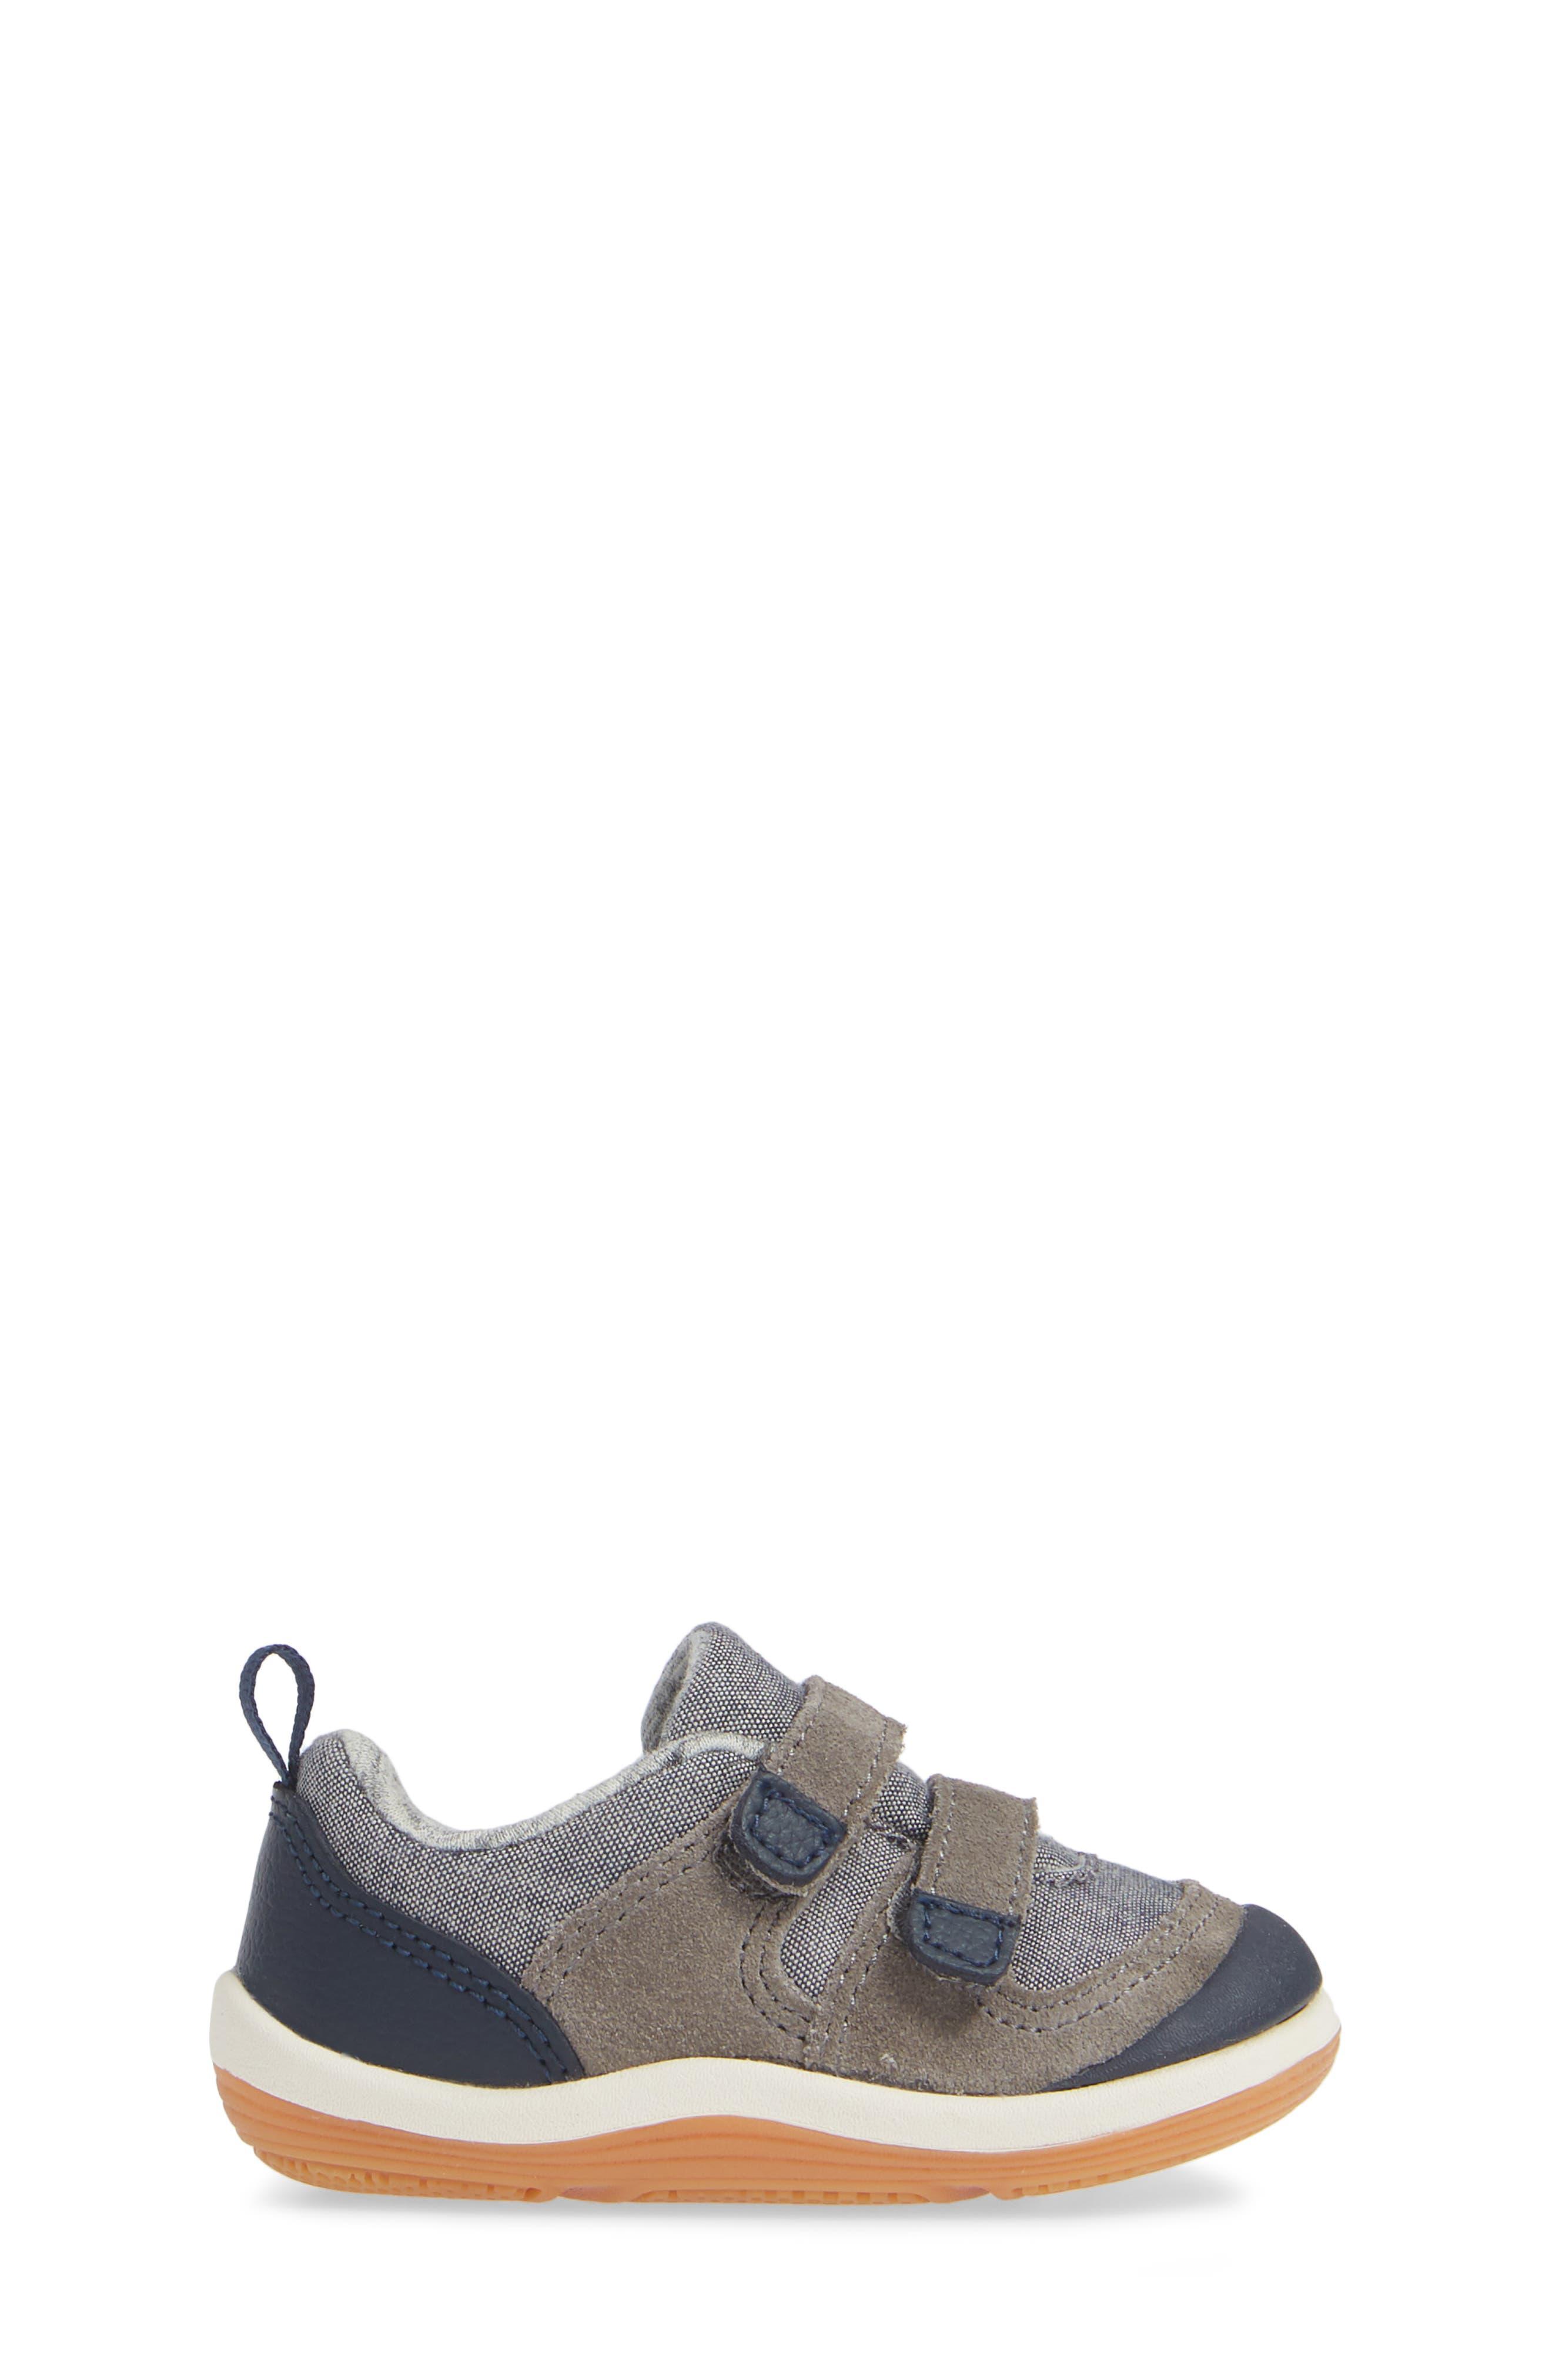 Kieran Sneaker,                             Alternate thumbnail 3, color,                             410